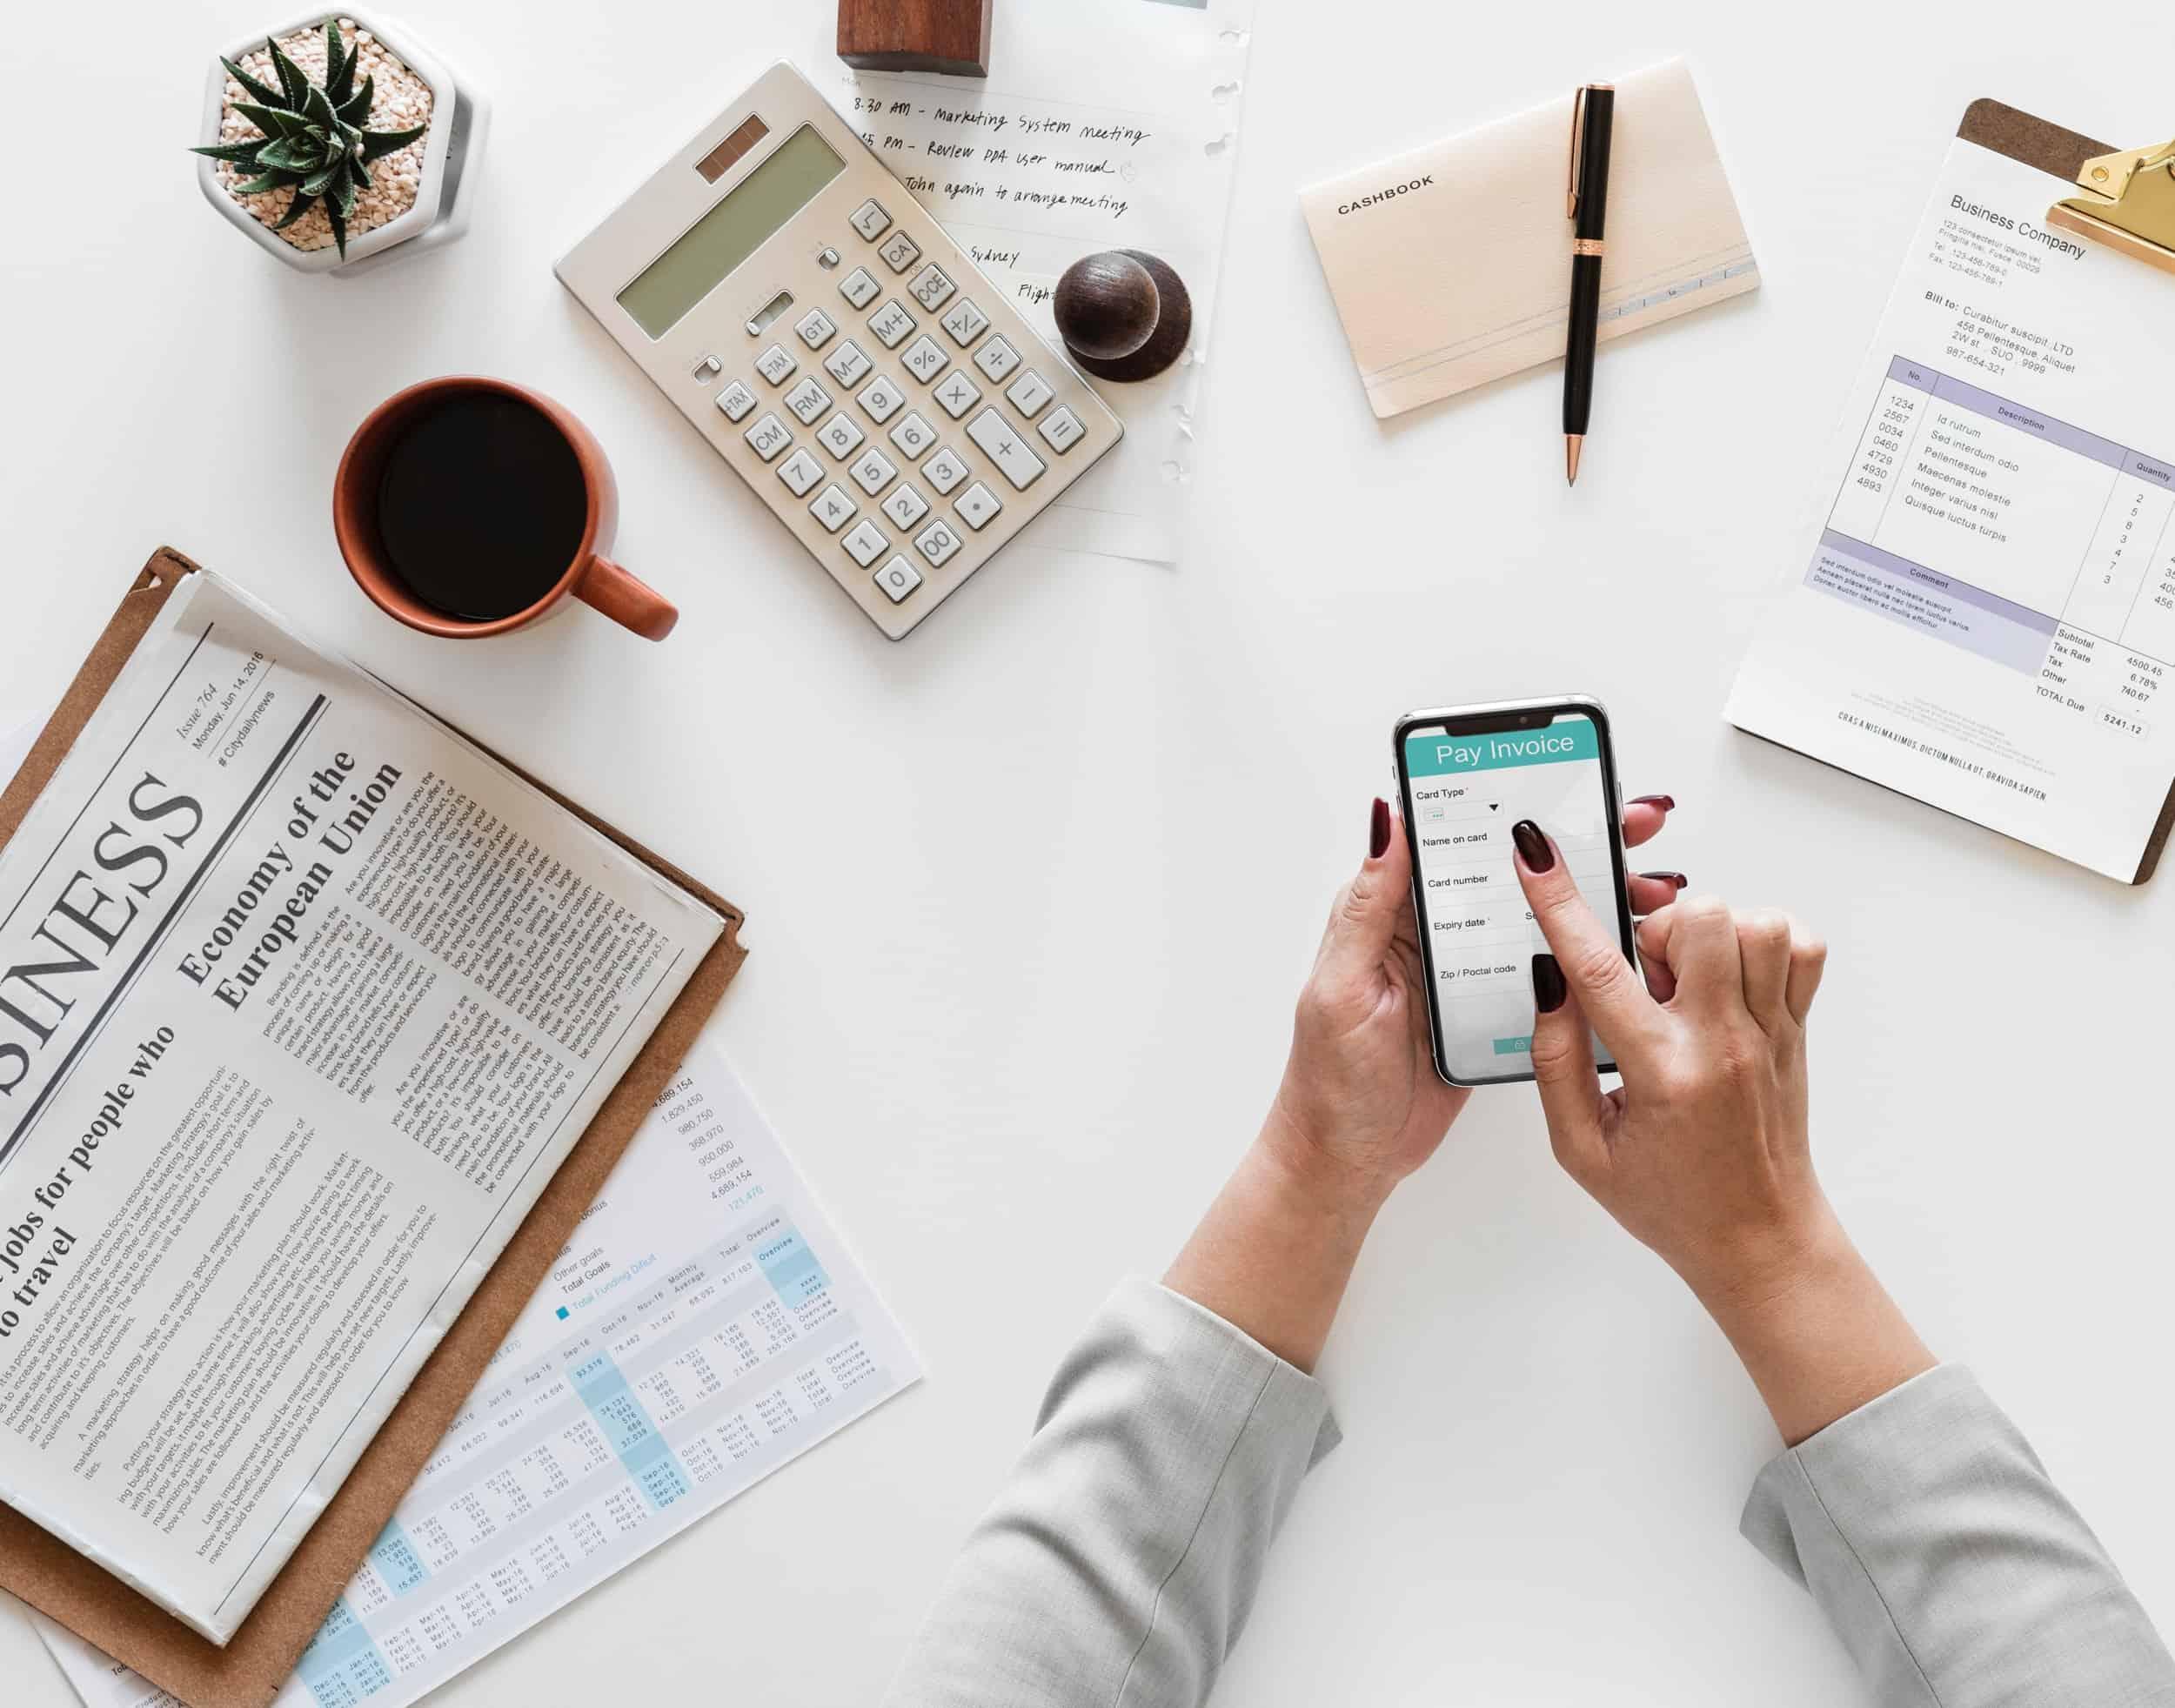 Calculating weekly financial progress